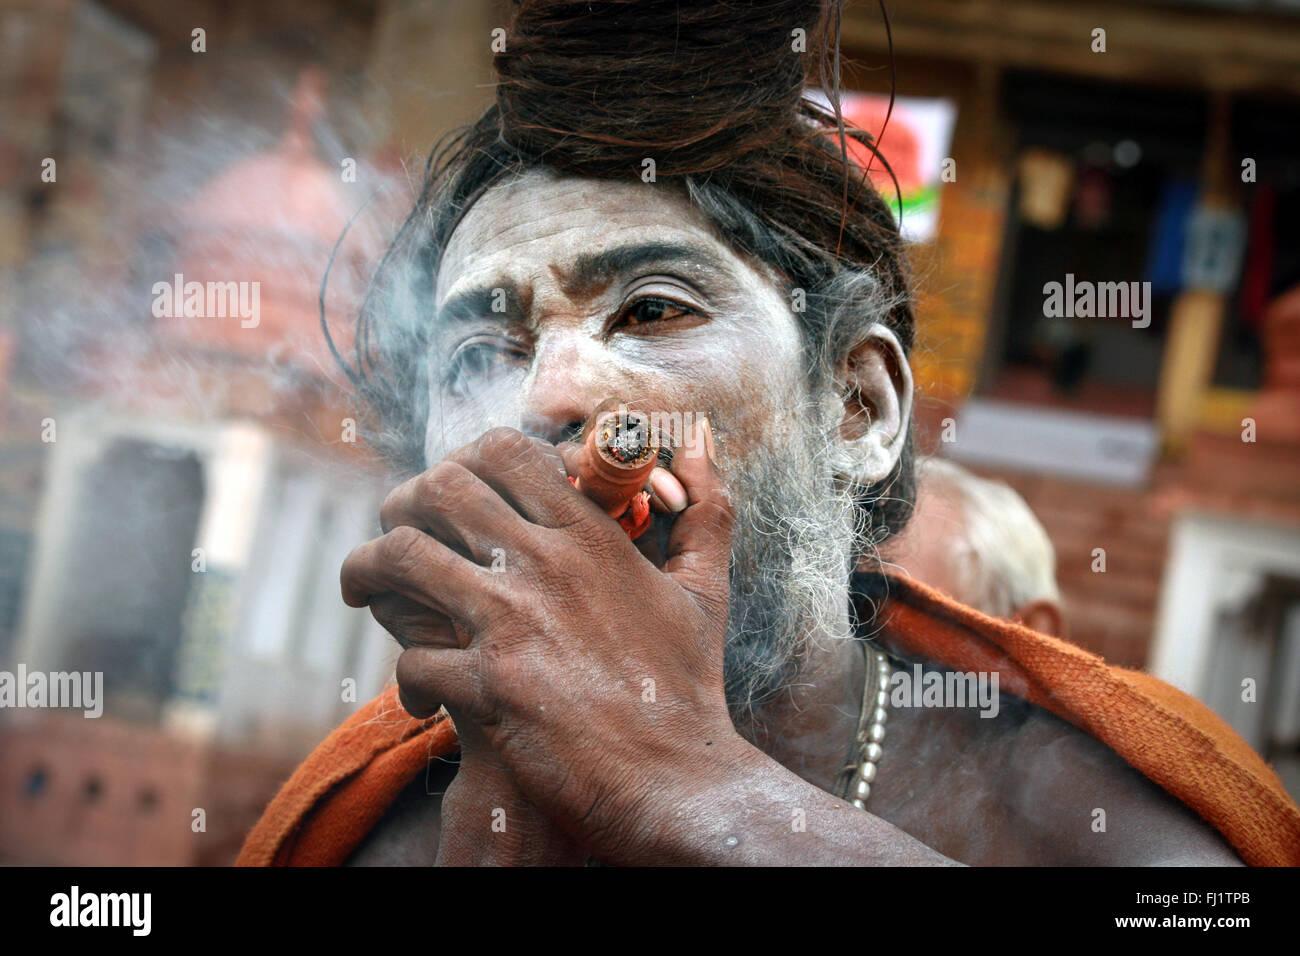 Sadhu holy man smoking chillum in  Varanasi, India - Stock Image